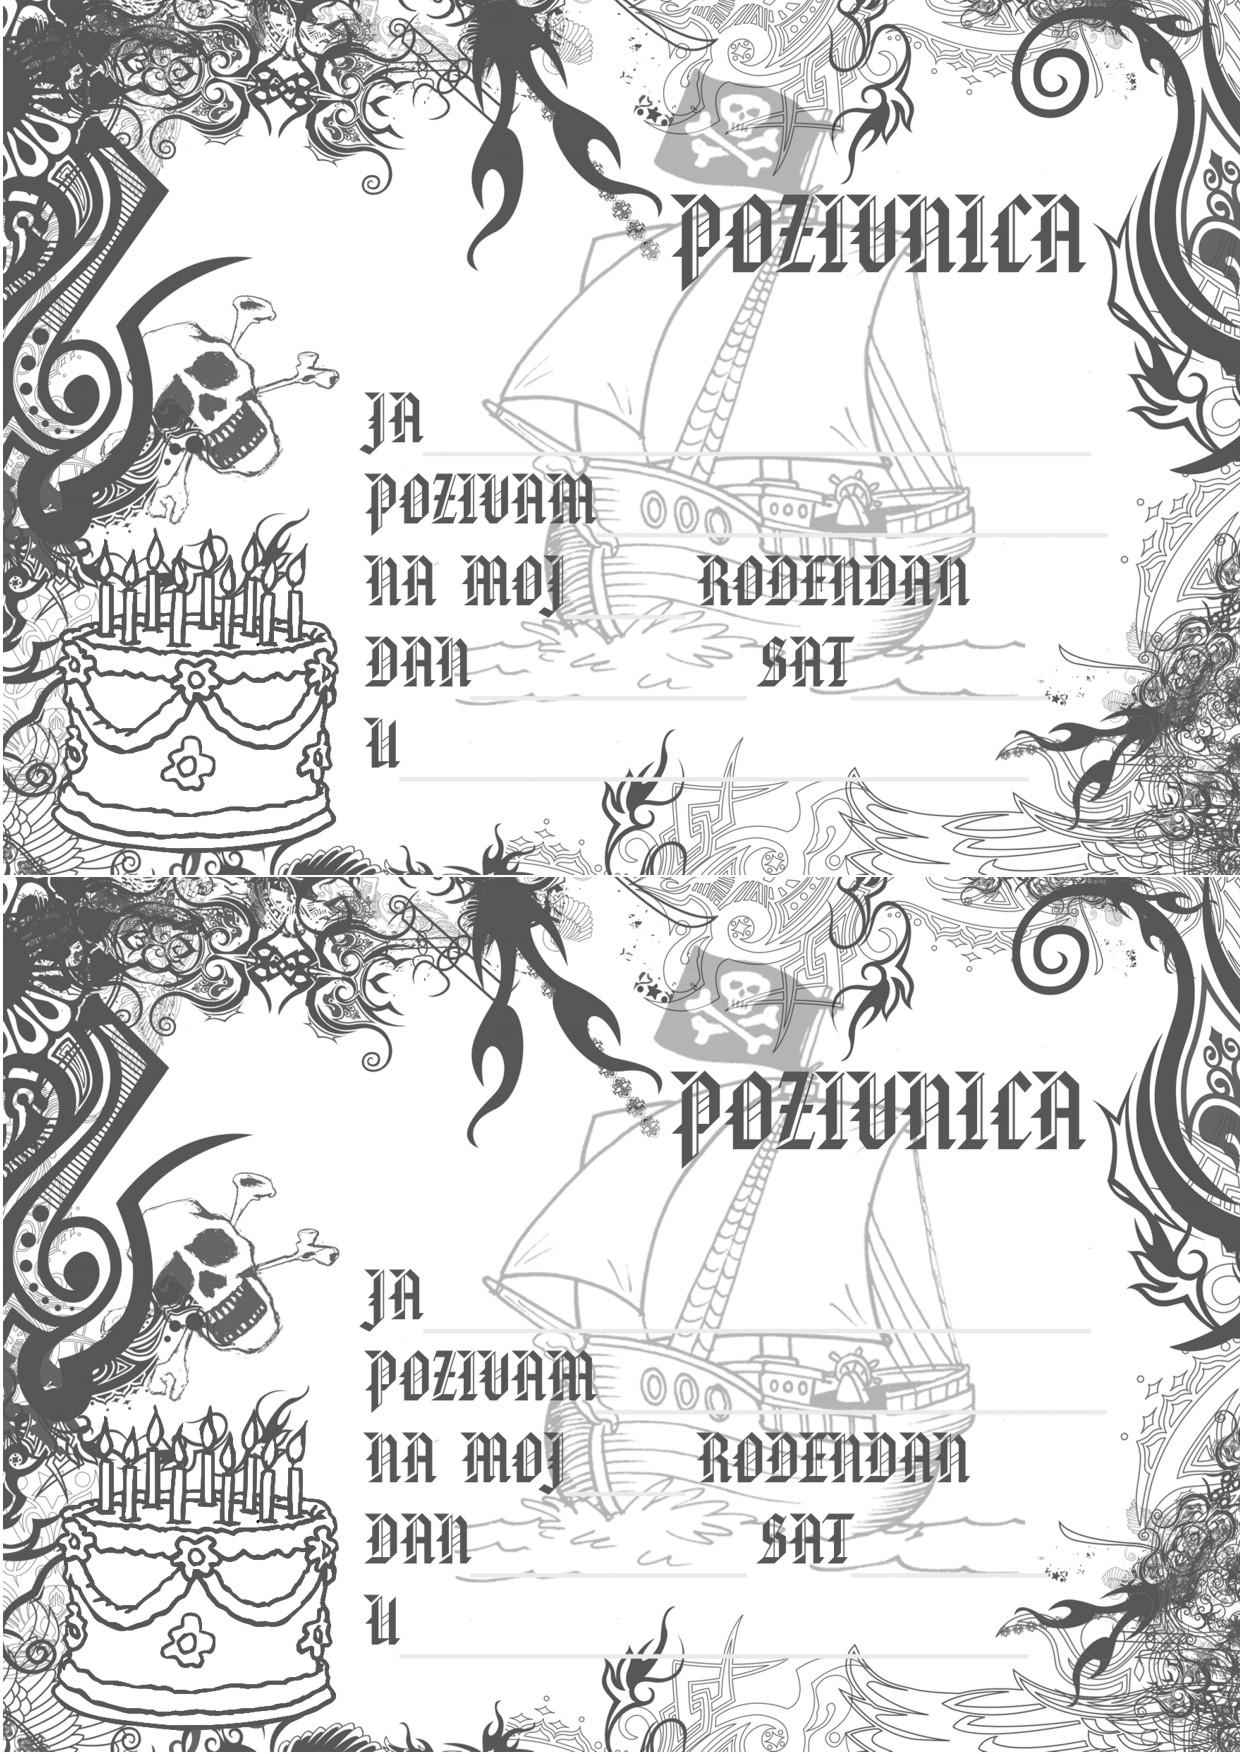 crtezi za rodjendan Index of /za rodjendan/pozivnice za rodjendan print cb crtezi za rodjendan